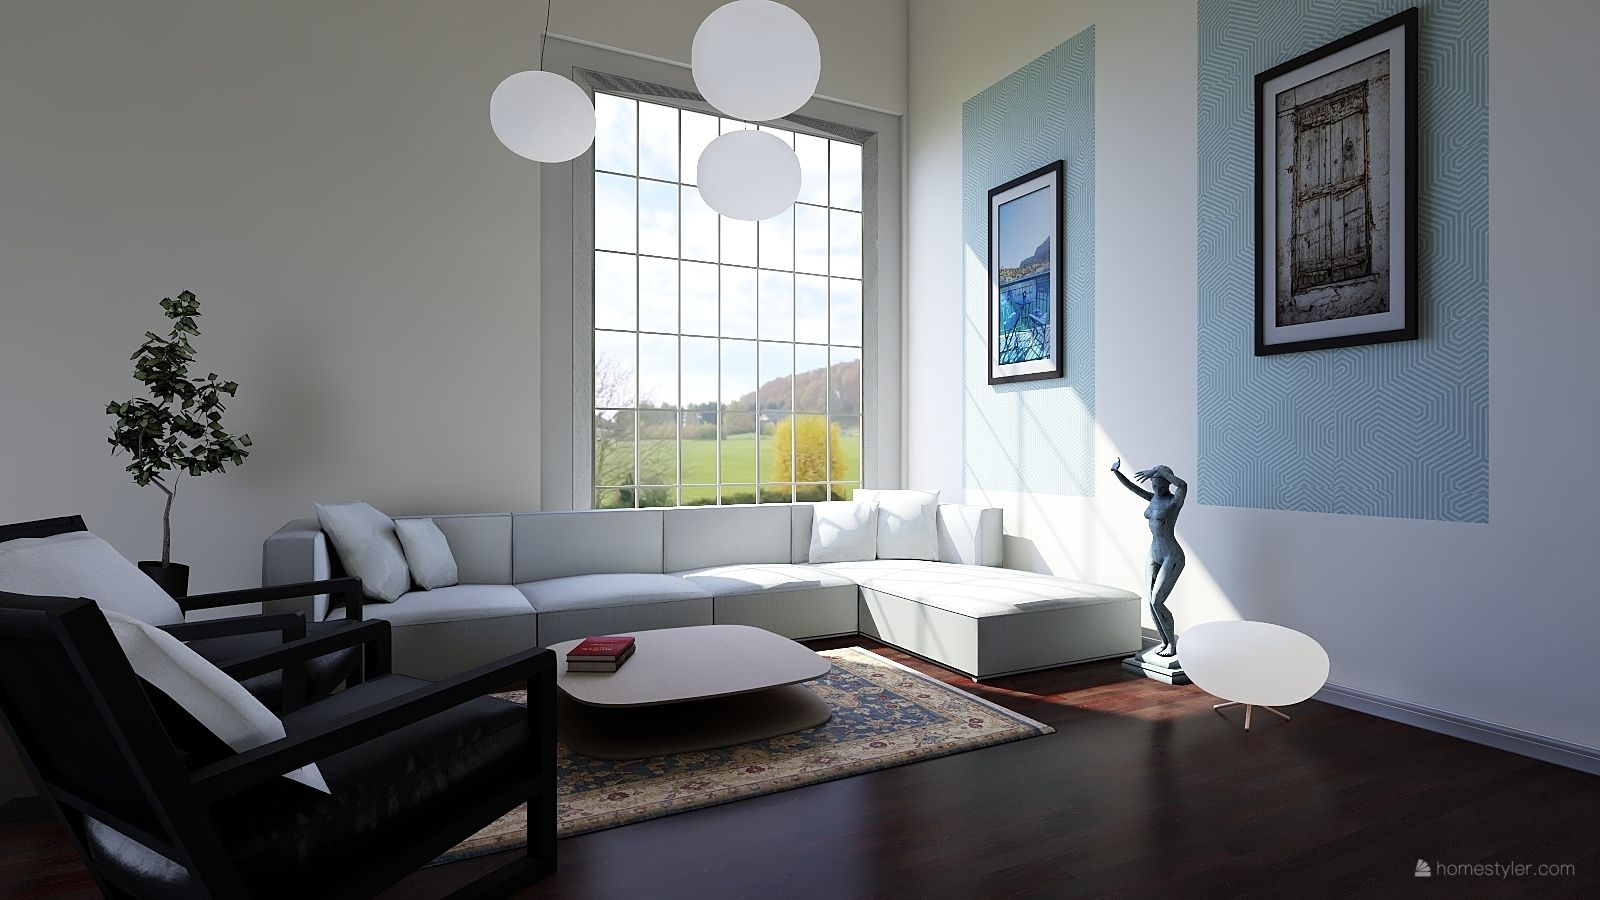 Living Room Design By Ucha Uchava Interiordesign Homedecor 3d Home Design Software 3d Home Design Home Design Software